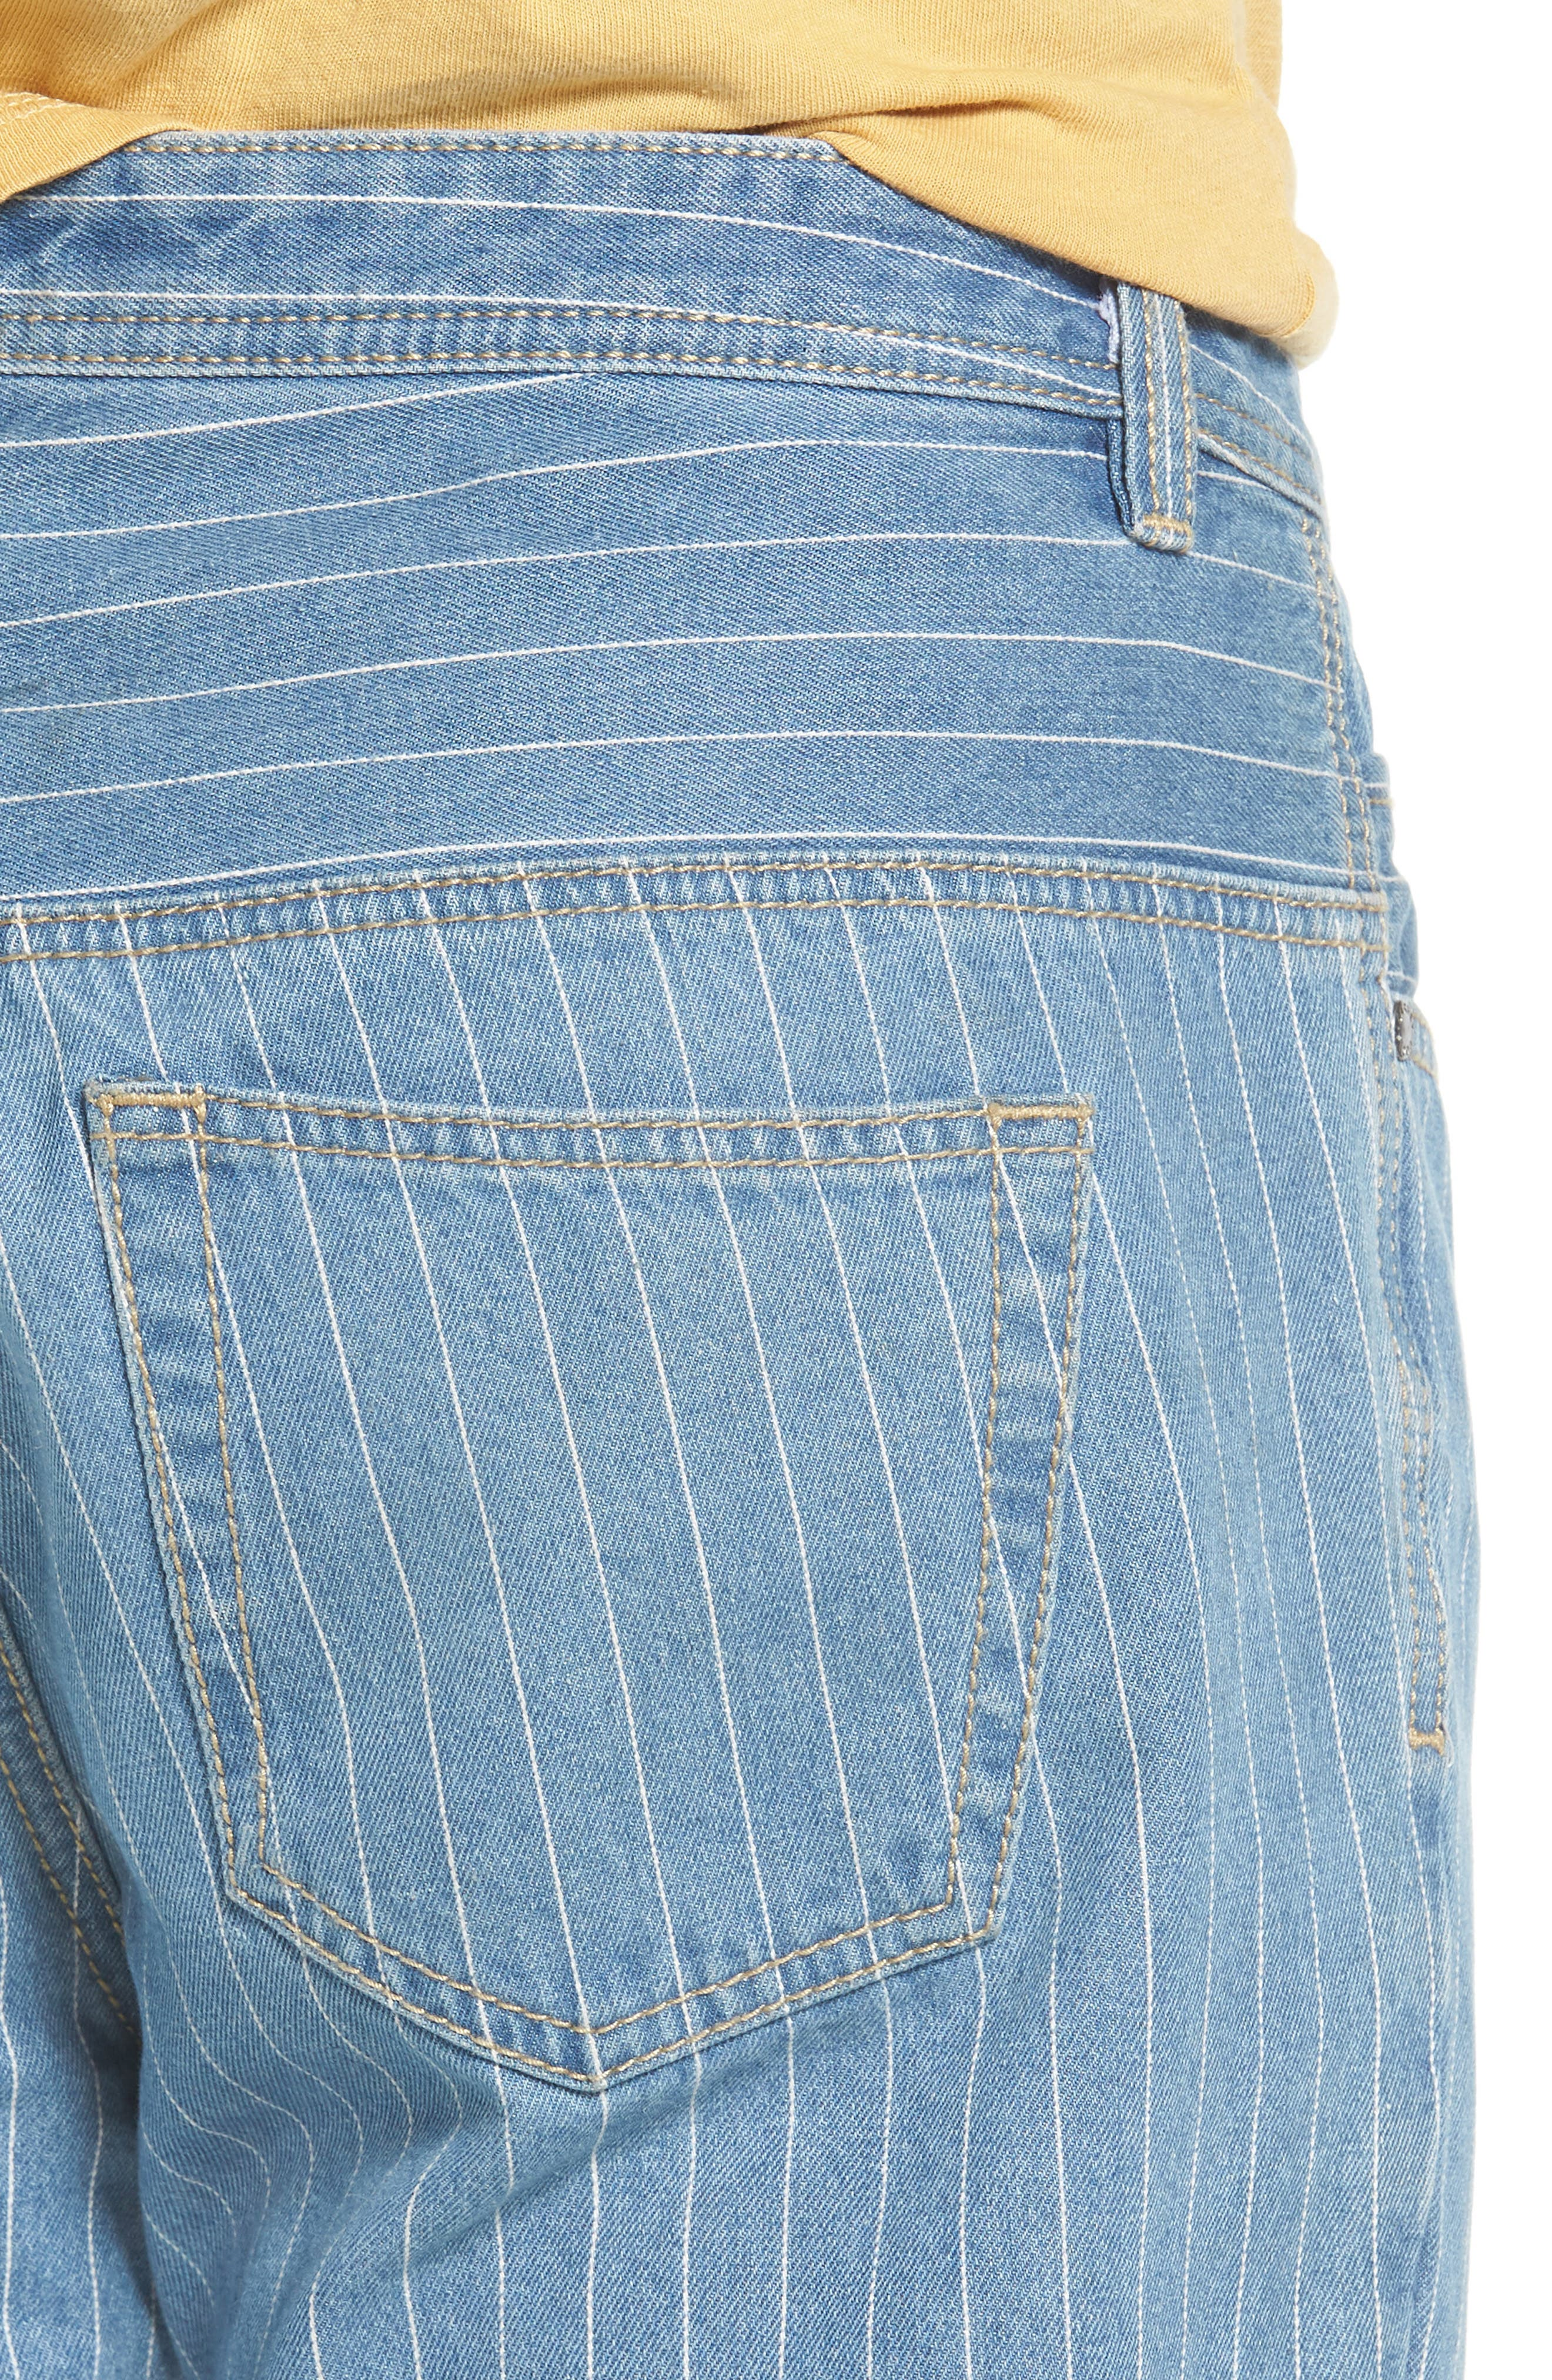 B. Relaxed Jeans,                             Alternate thumbnail 4, color,                             Stripe Denim Crop